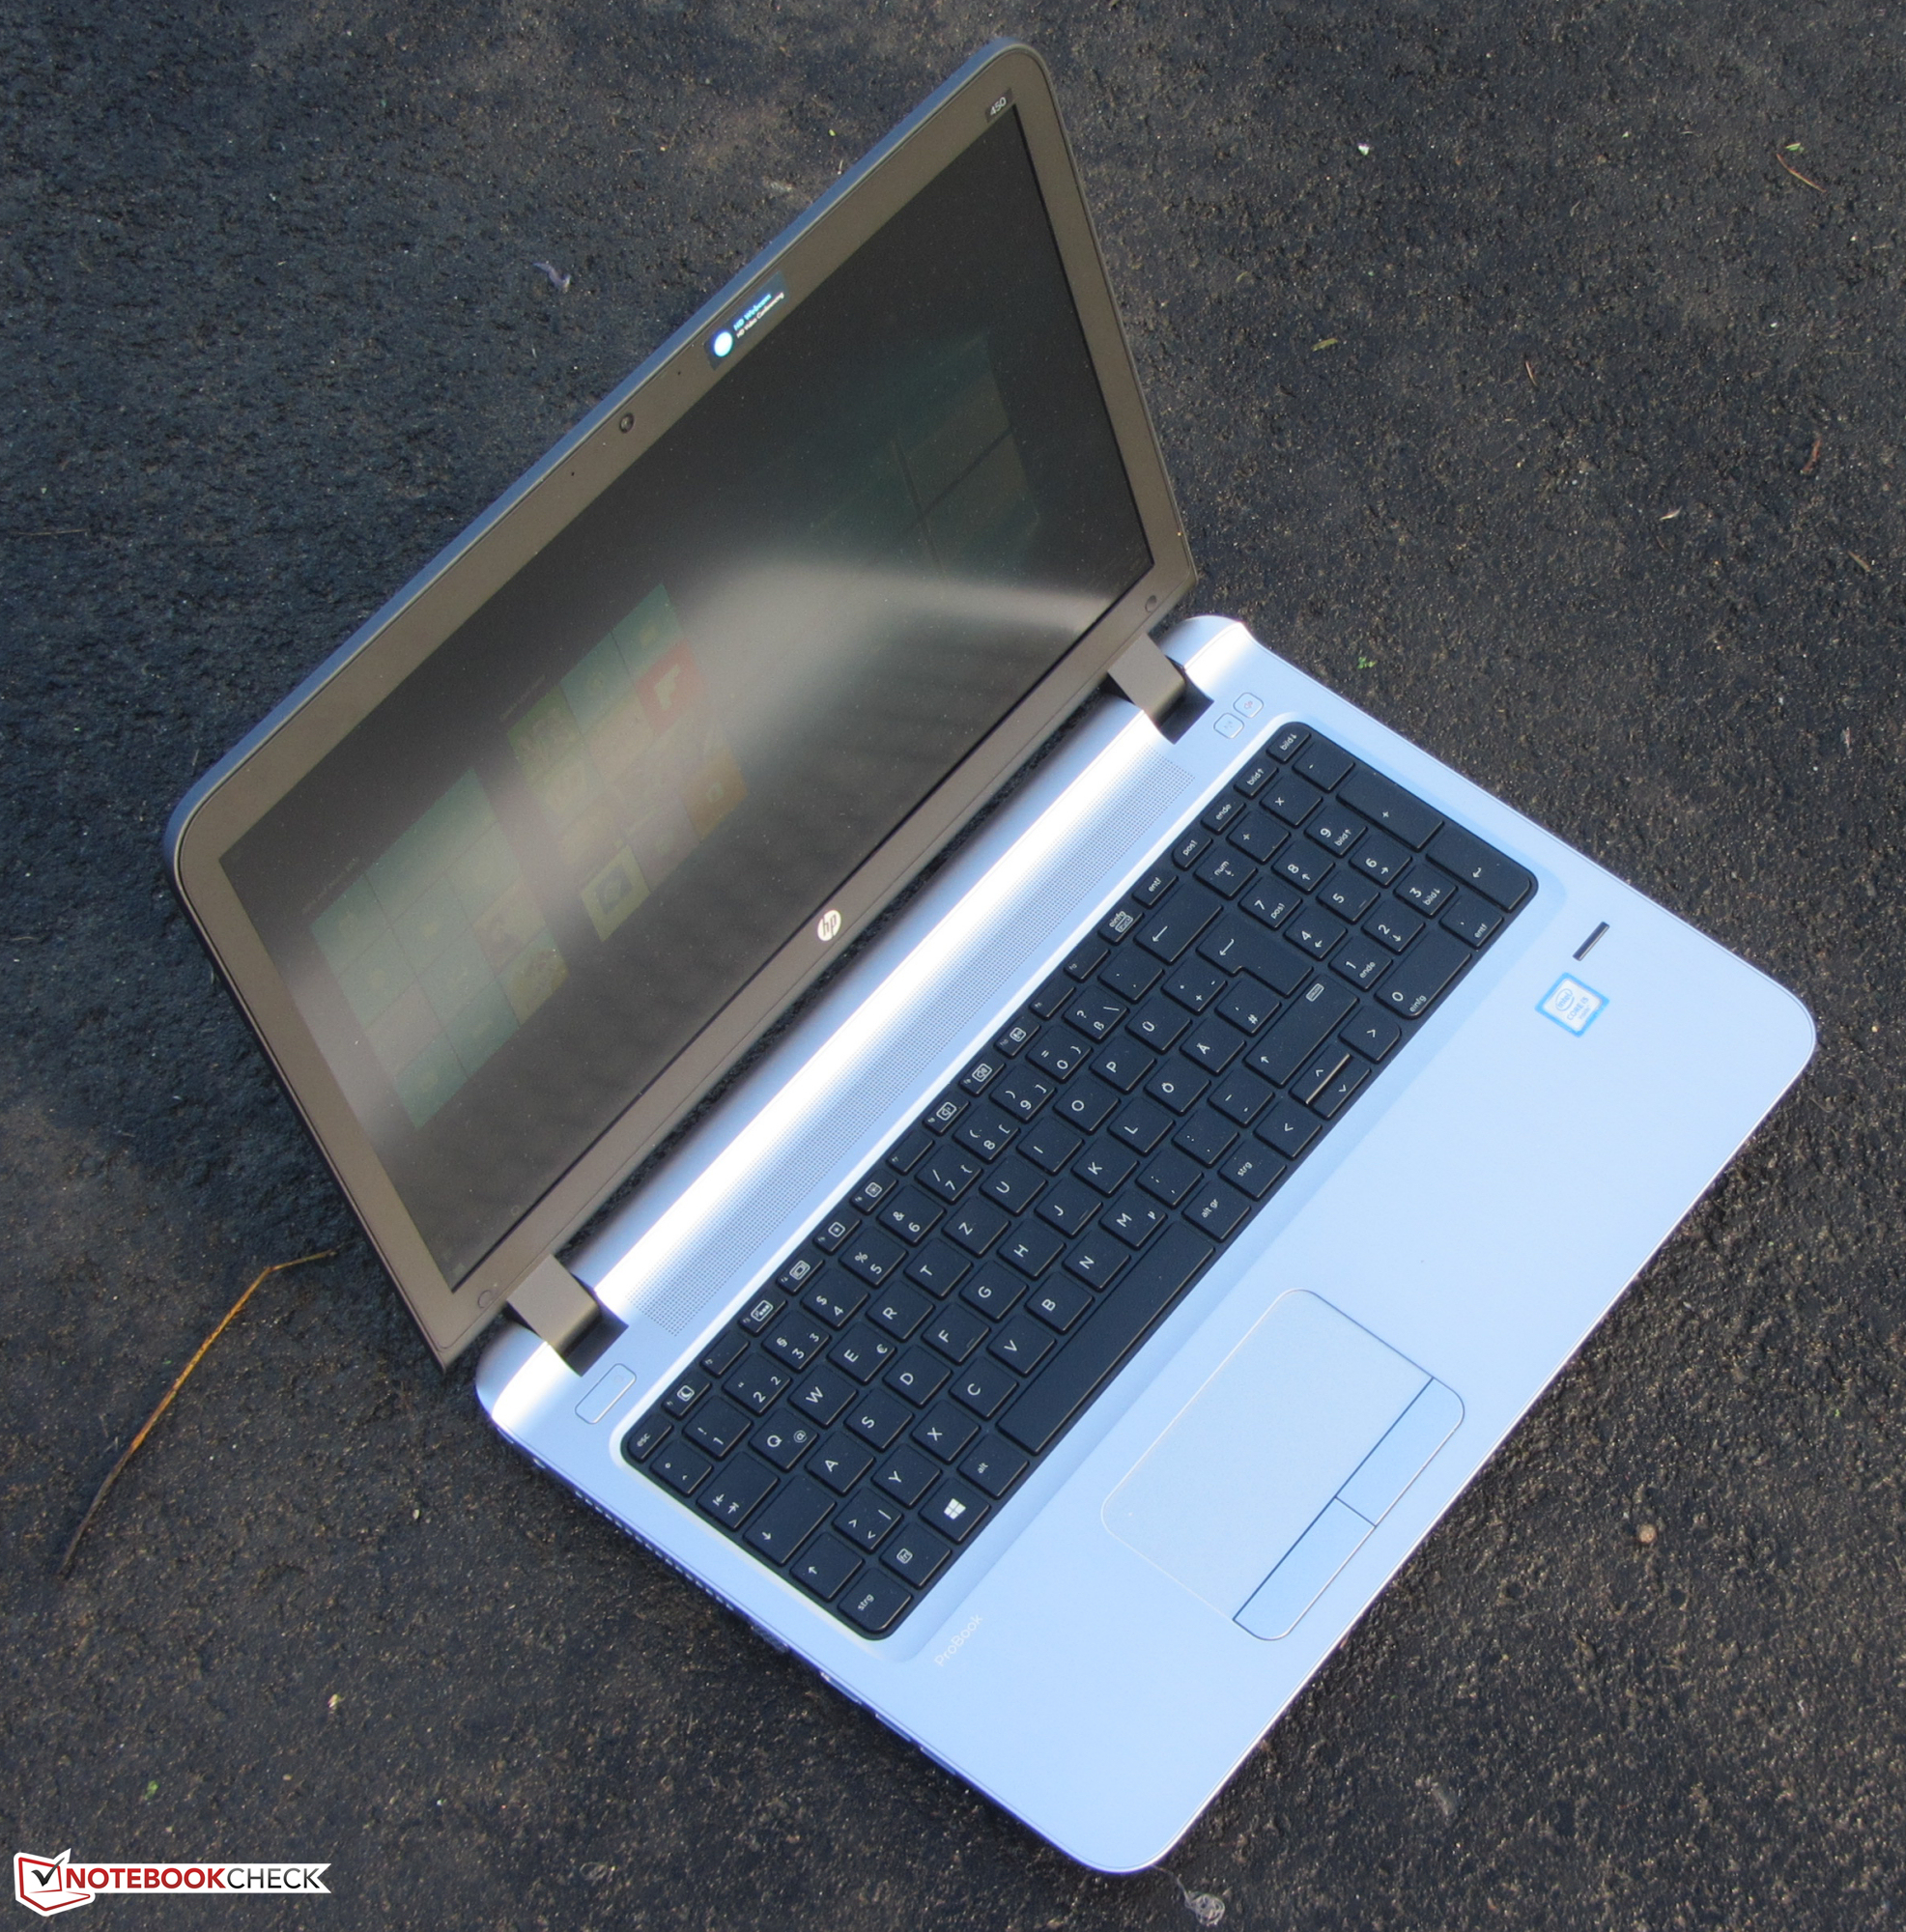 da0fd4c0f7ddf3 Courte critique du PC Portable HP ProBook 450 G3 - Notebookcheck.fr